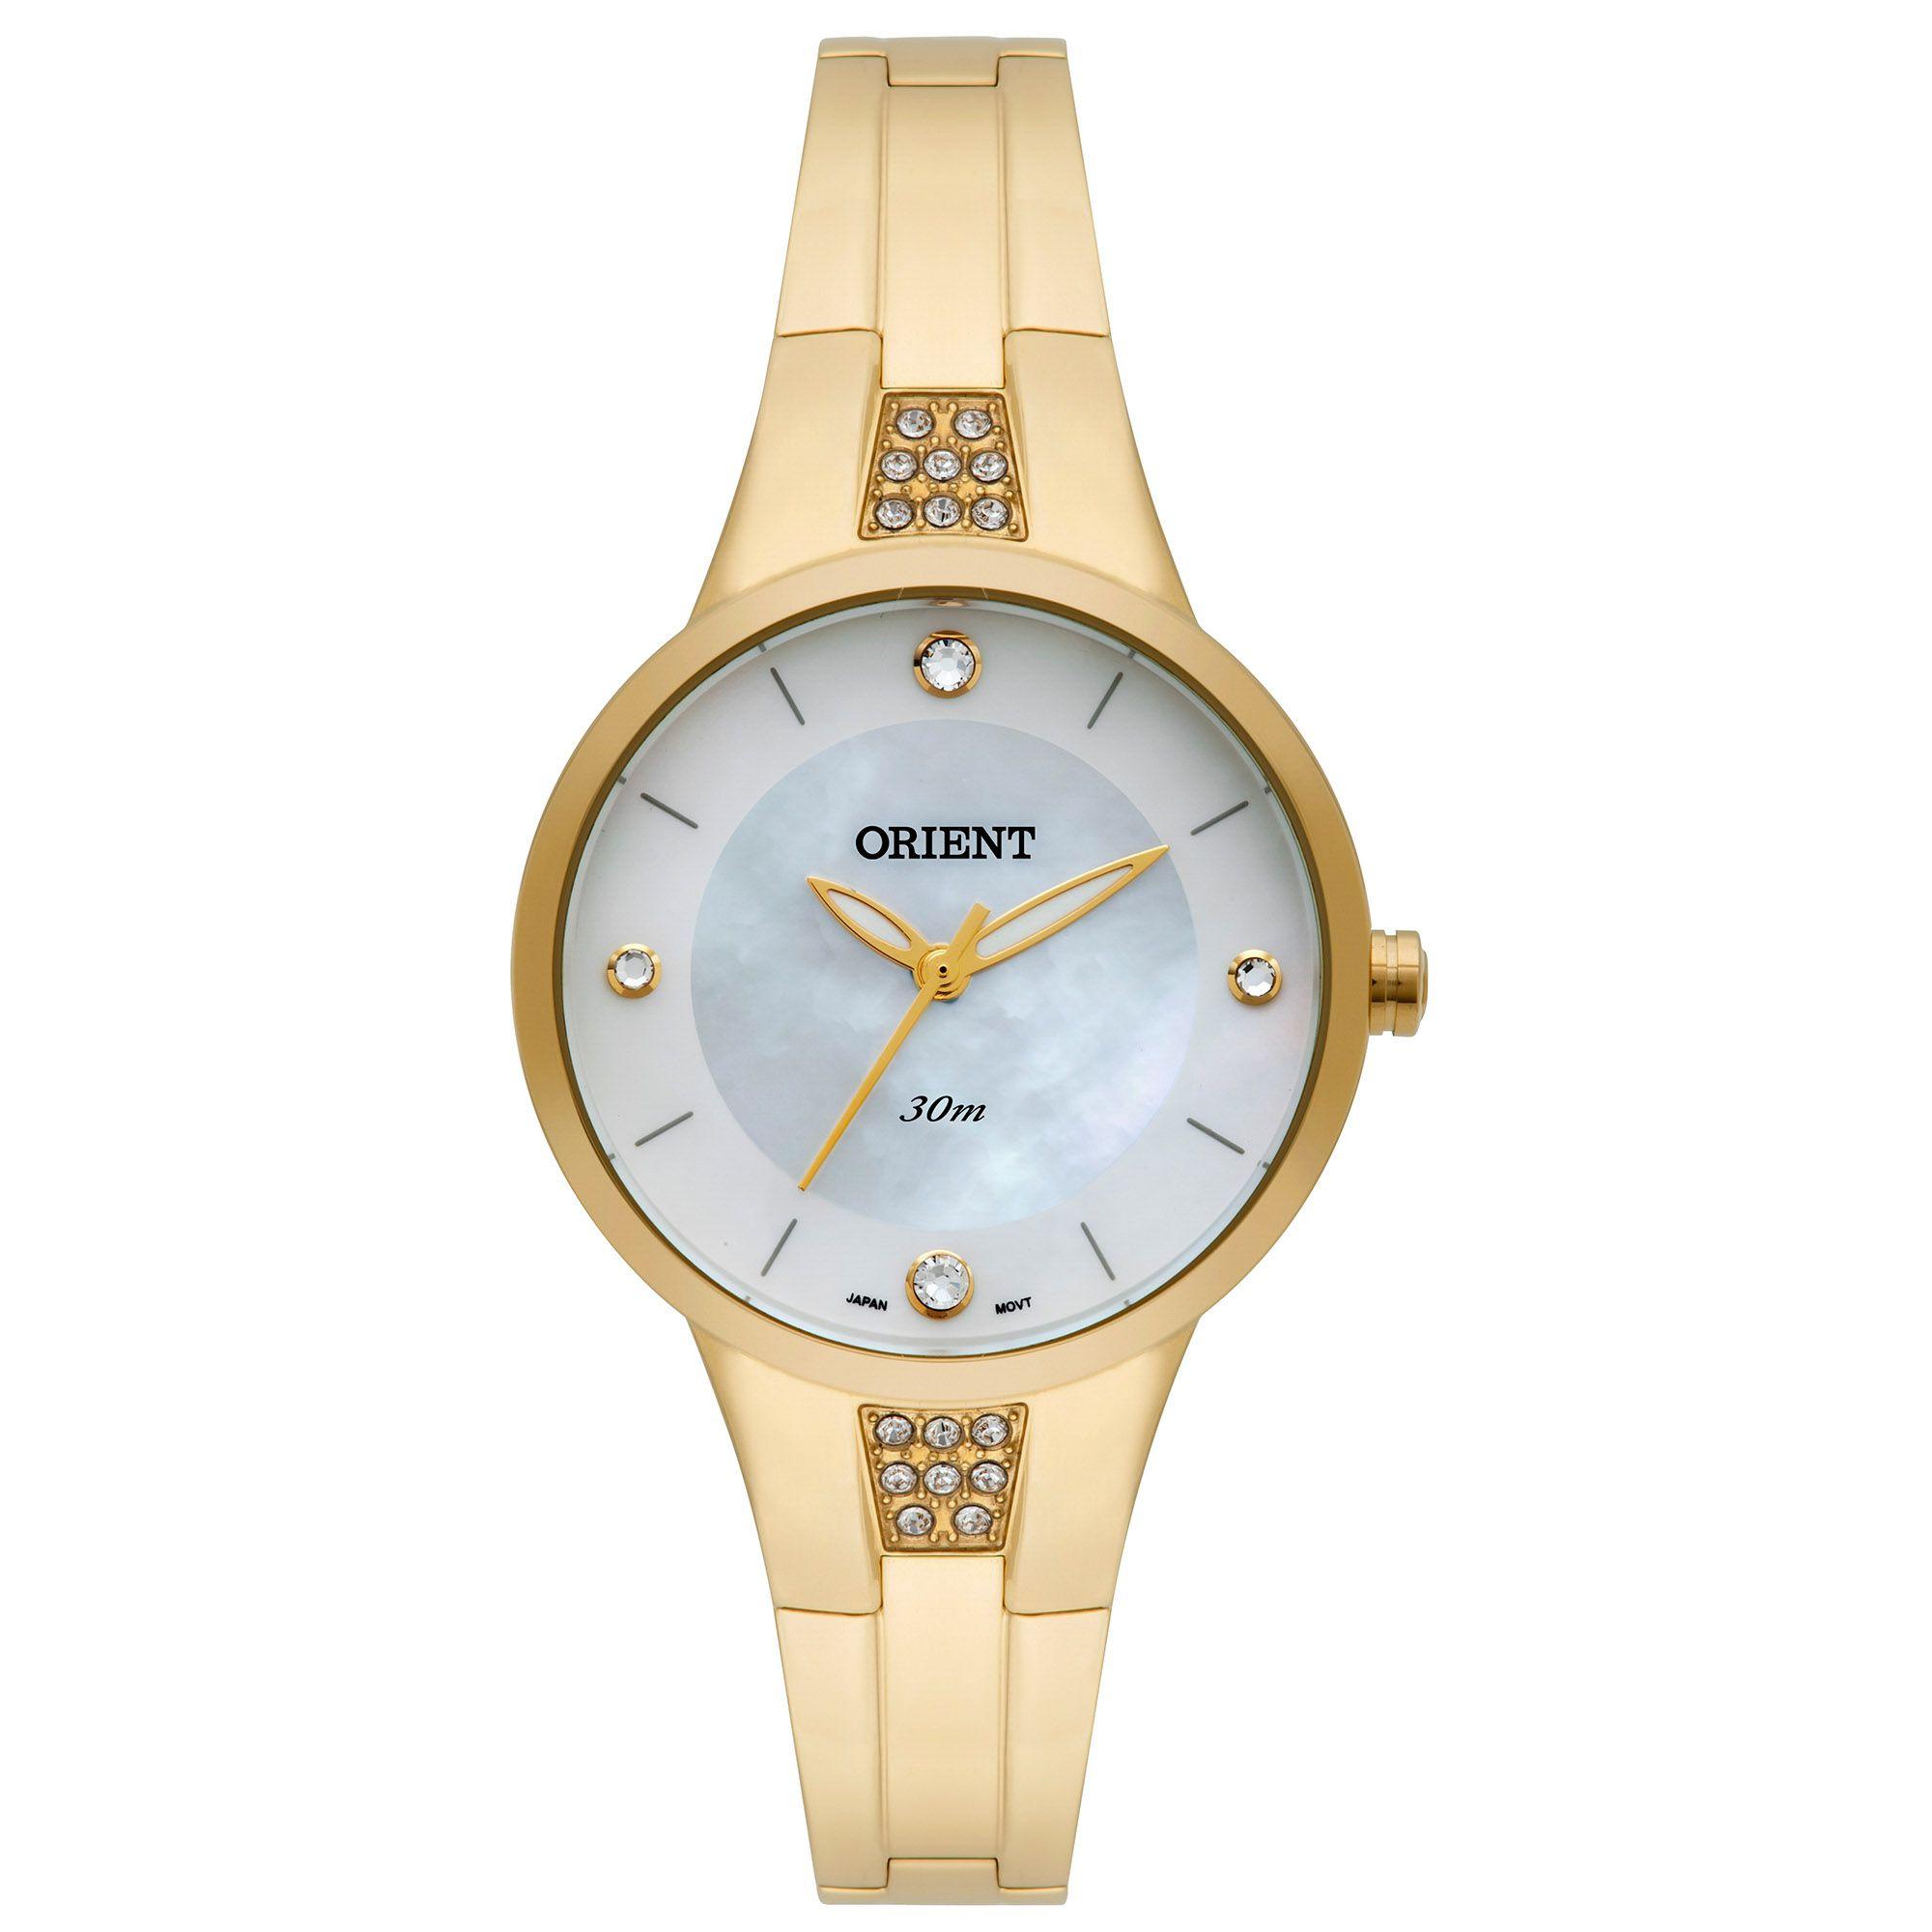 Relógio Feminino Orient FGSS0056 B1KX